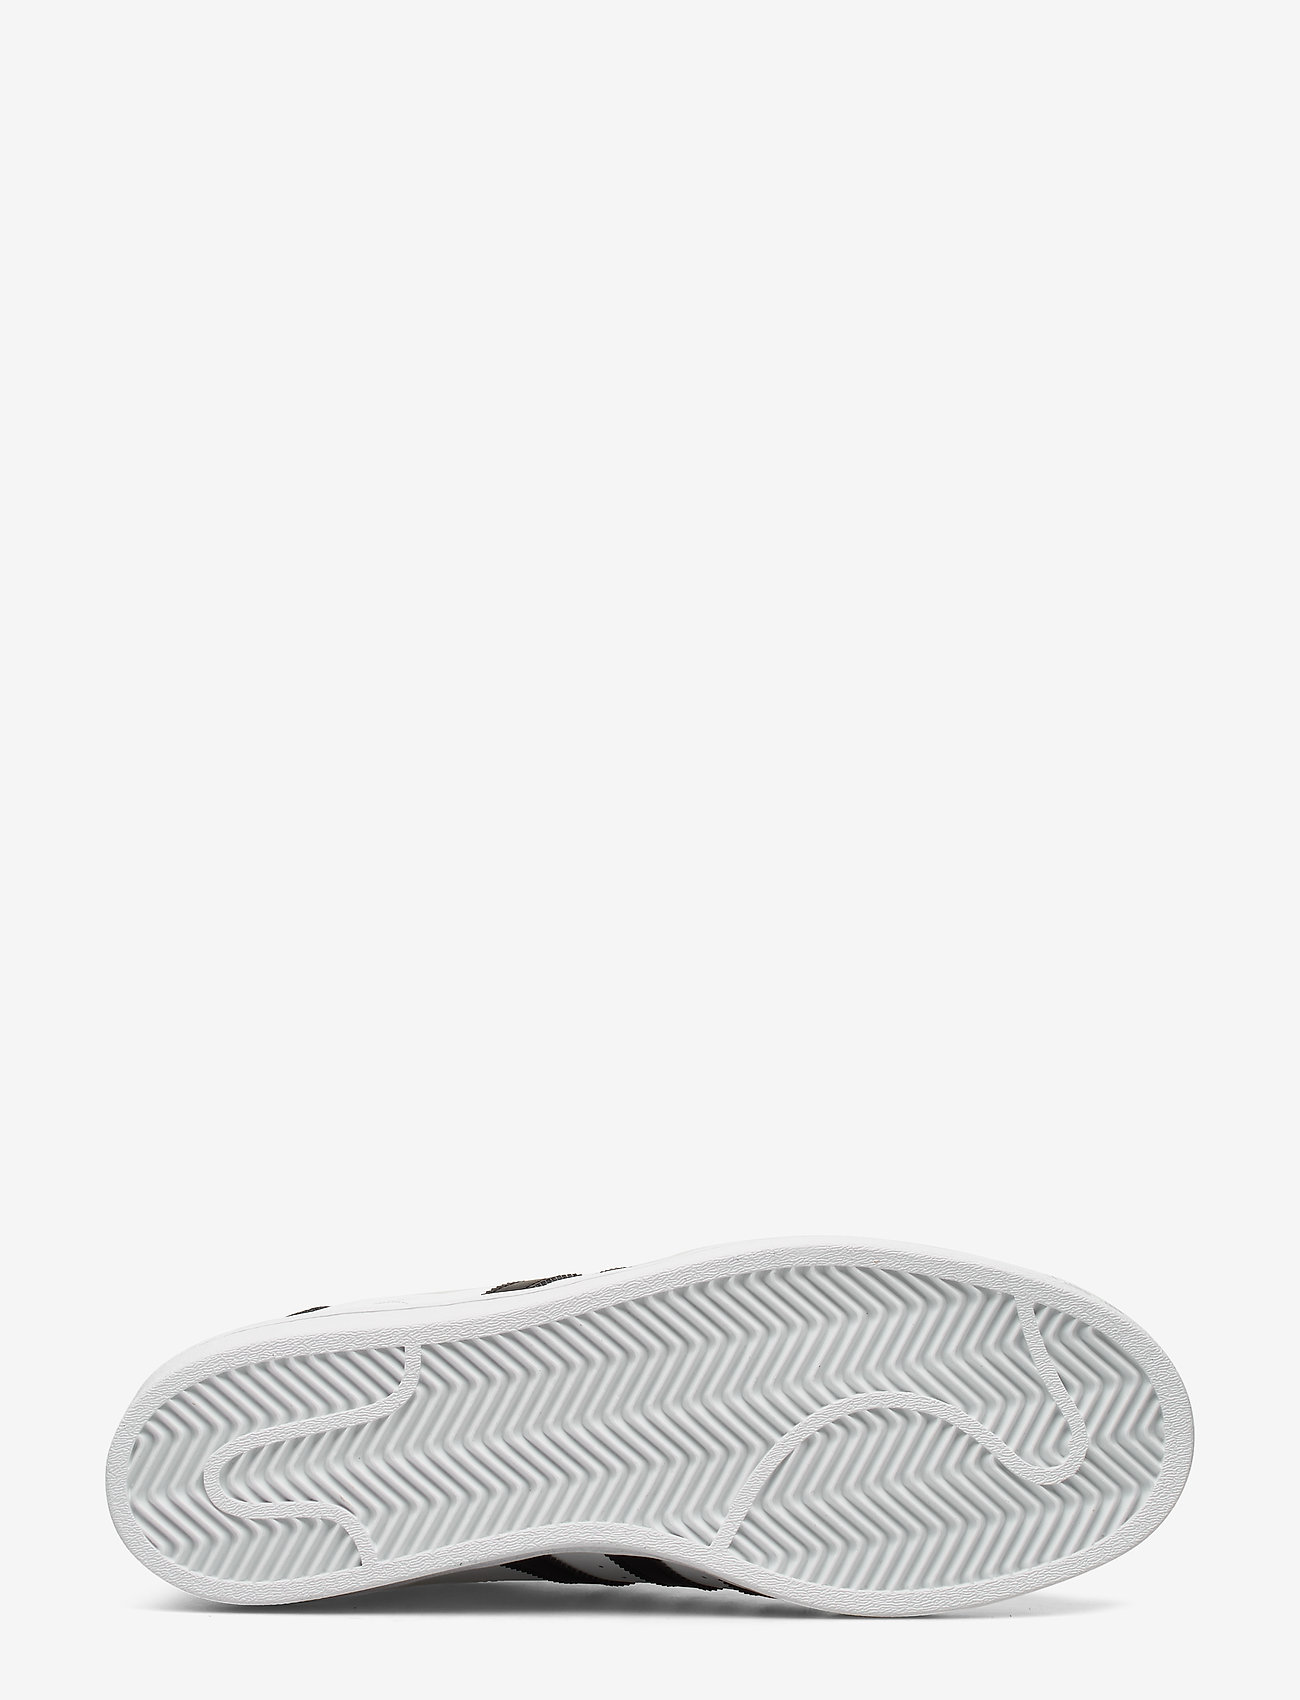 Adidas Originals Superstar - Baskets Ftwwht/cblack/ftwwht